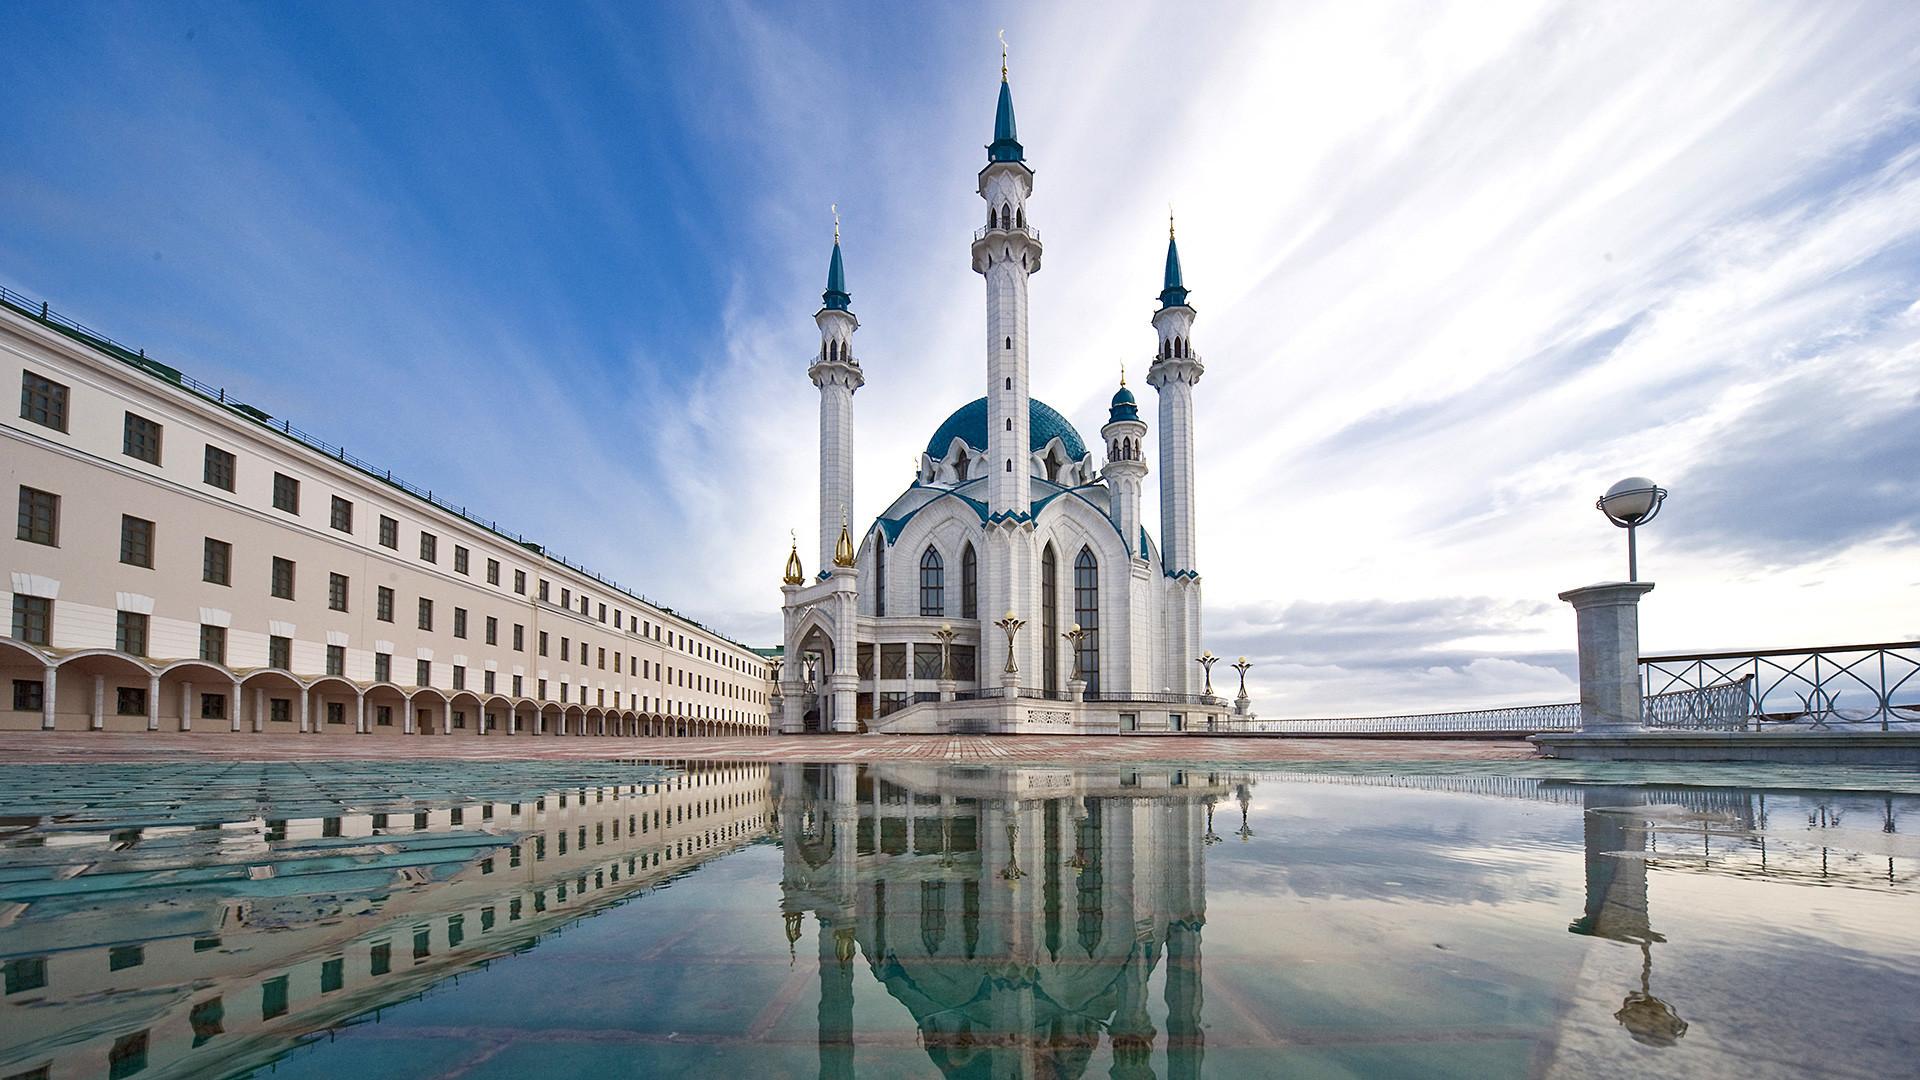 Mezquita de Qol ŠärifKul en Kazán.